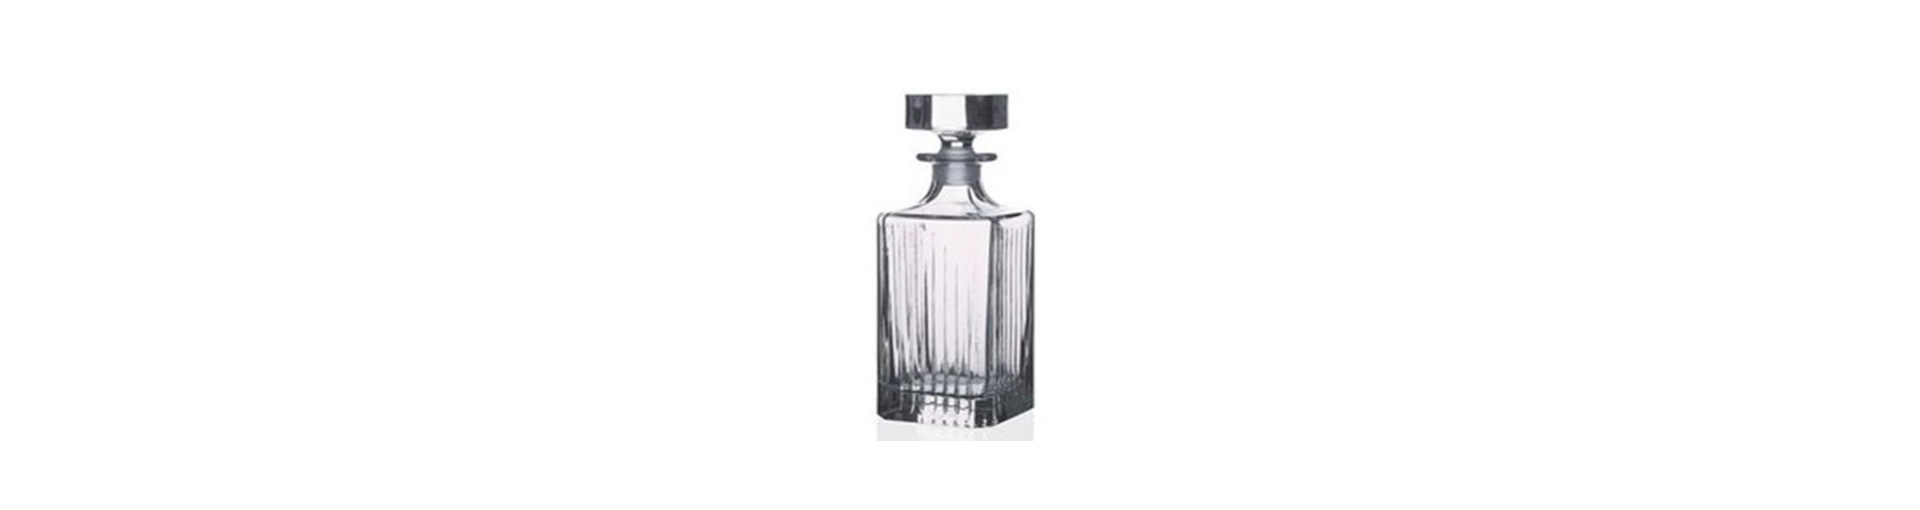 Carafes, jugs & bottles